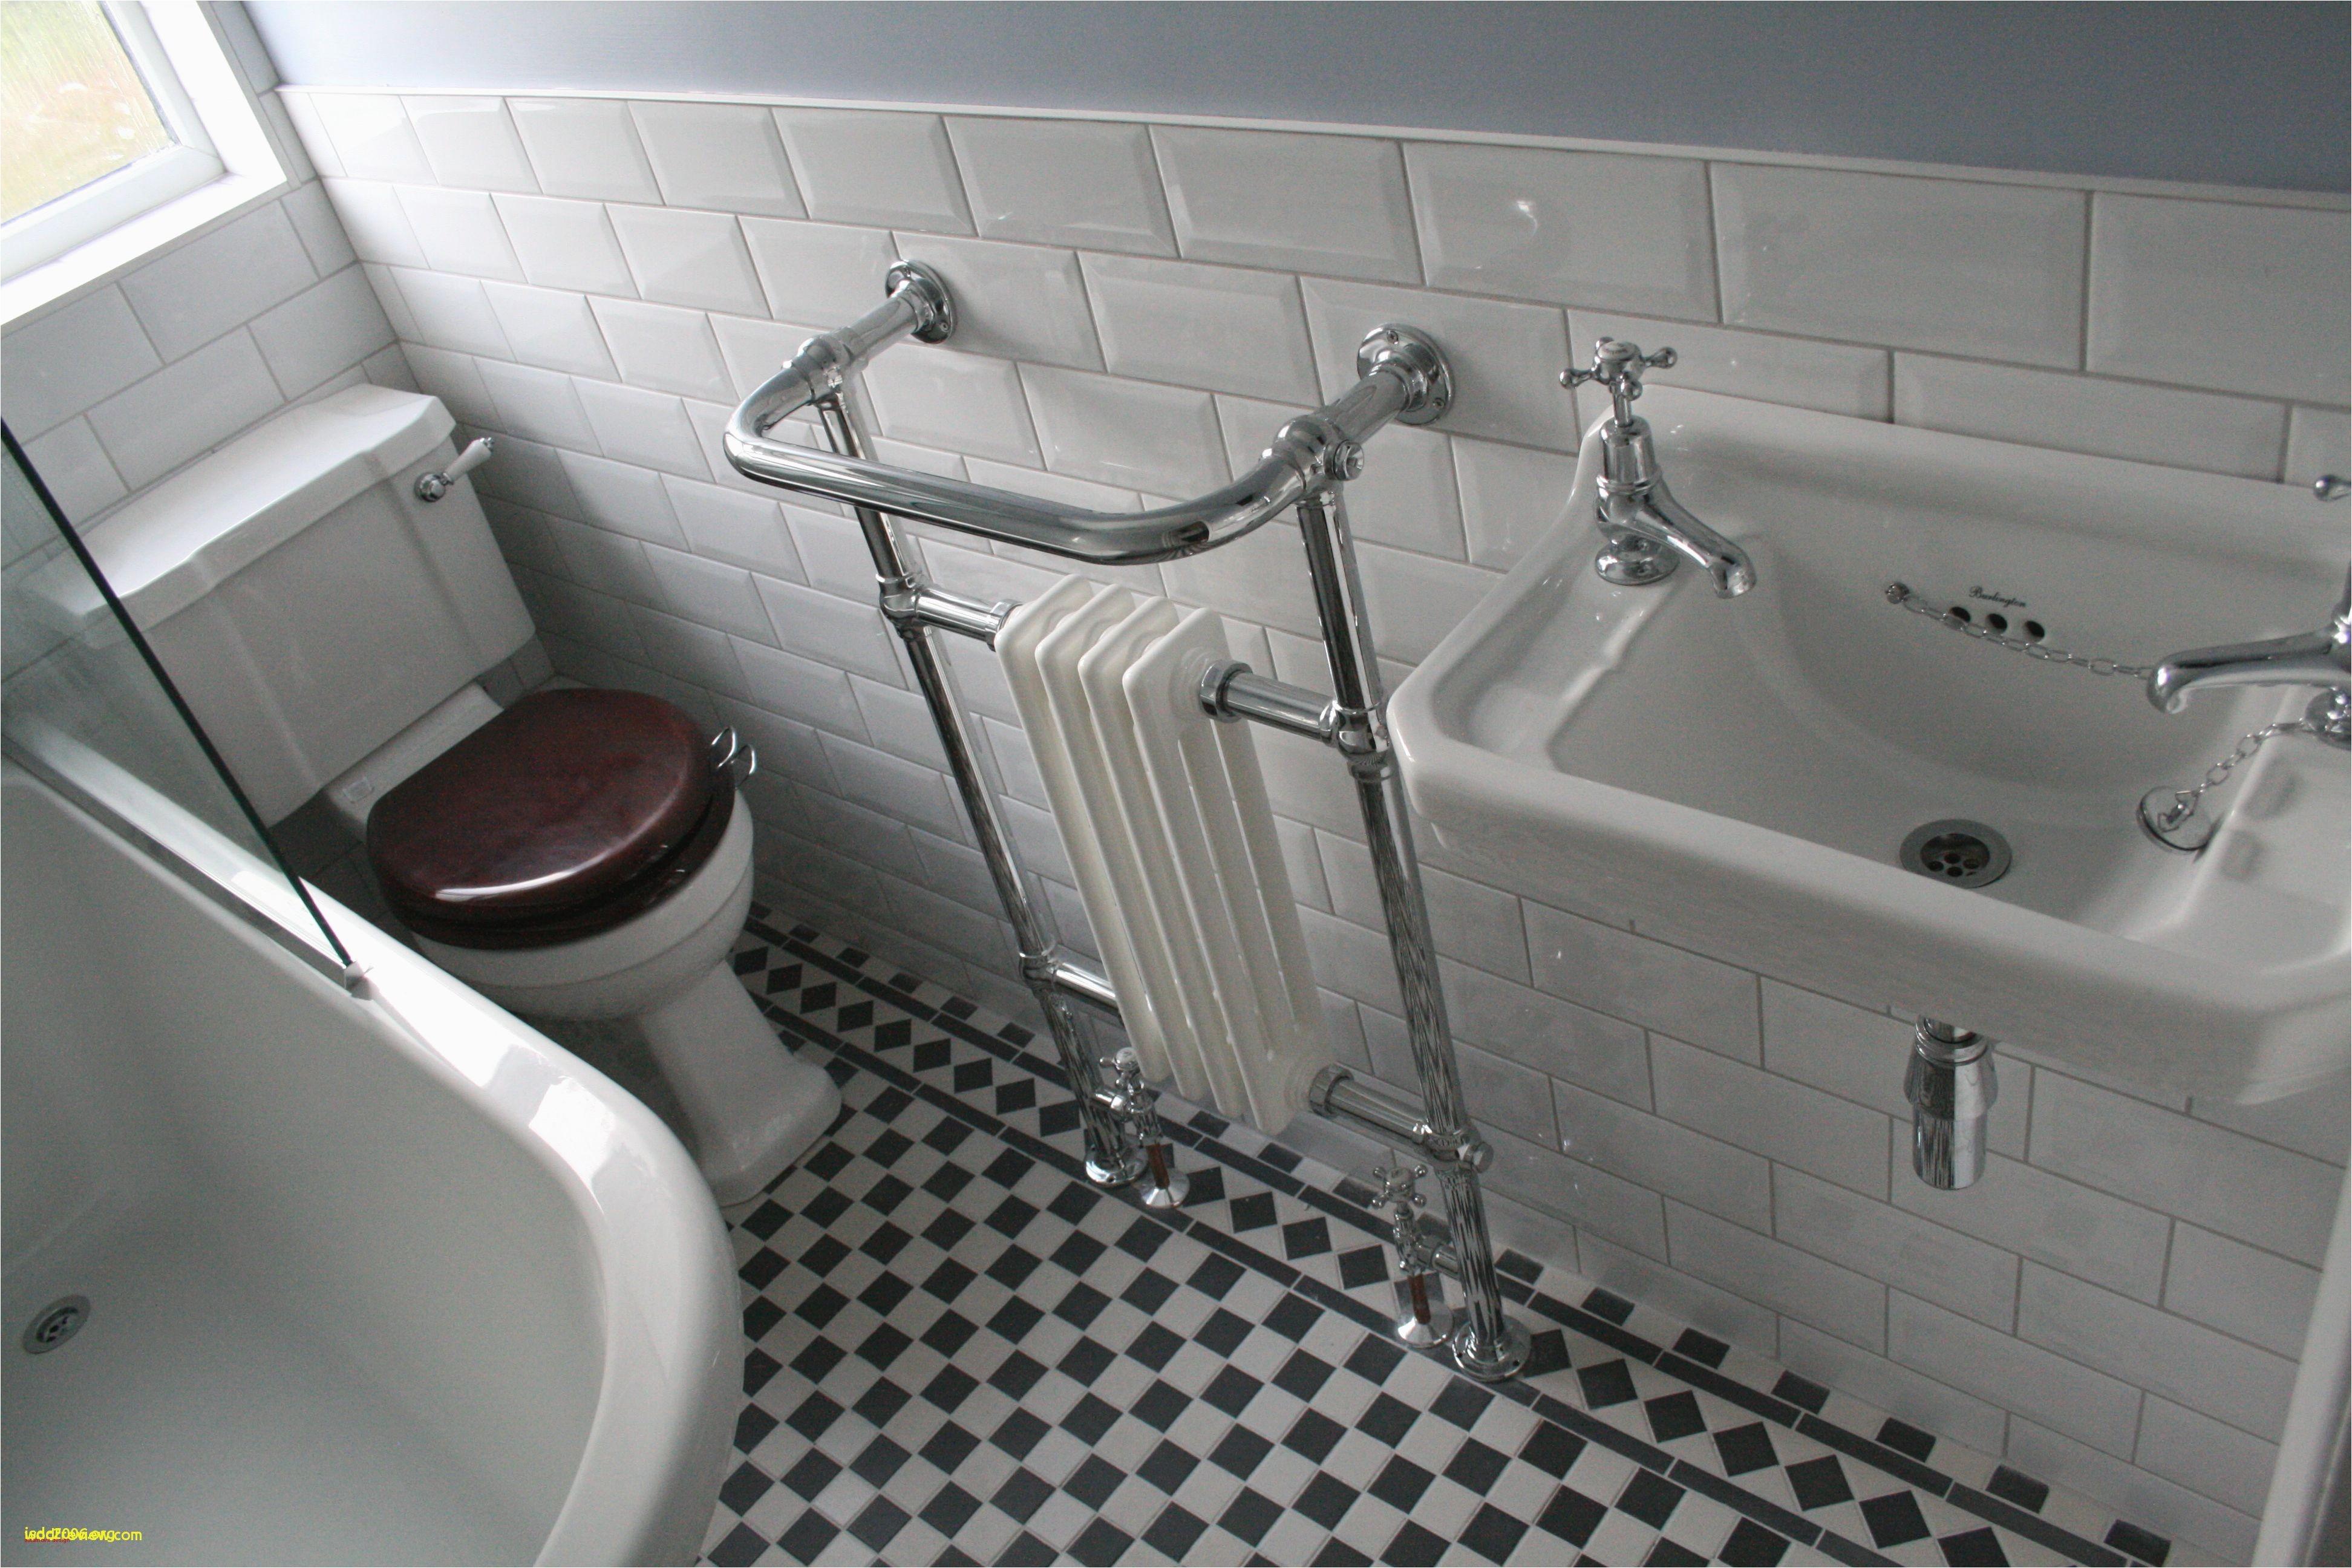 wallpaper for bathrooms ideas small bathroom design ideas luxury bathroom designer 0d tag